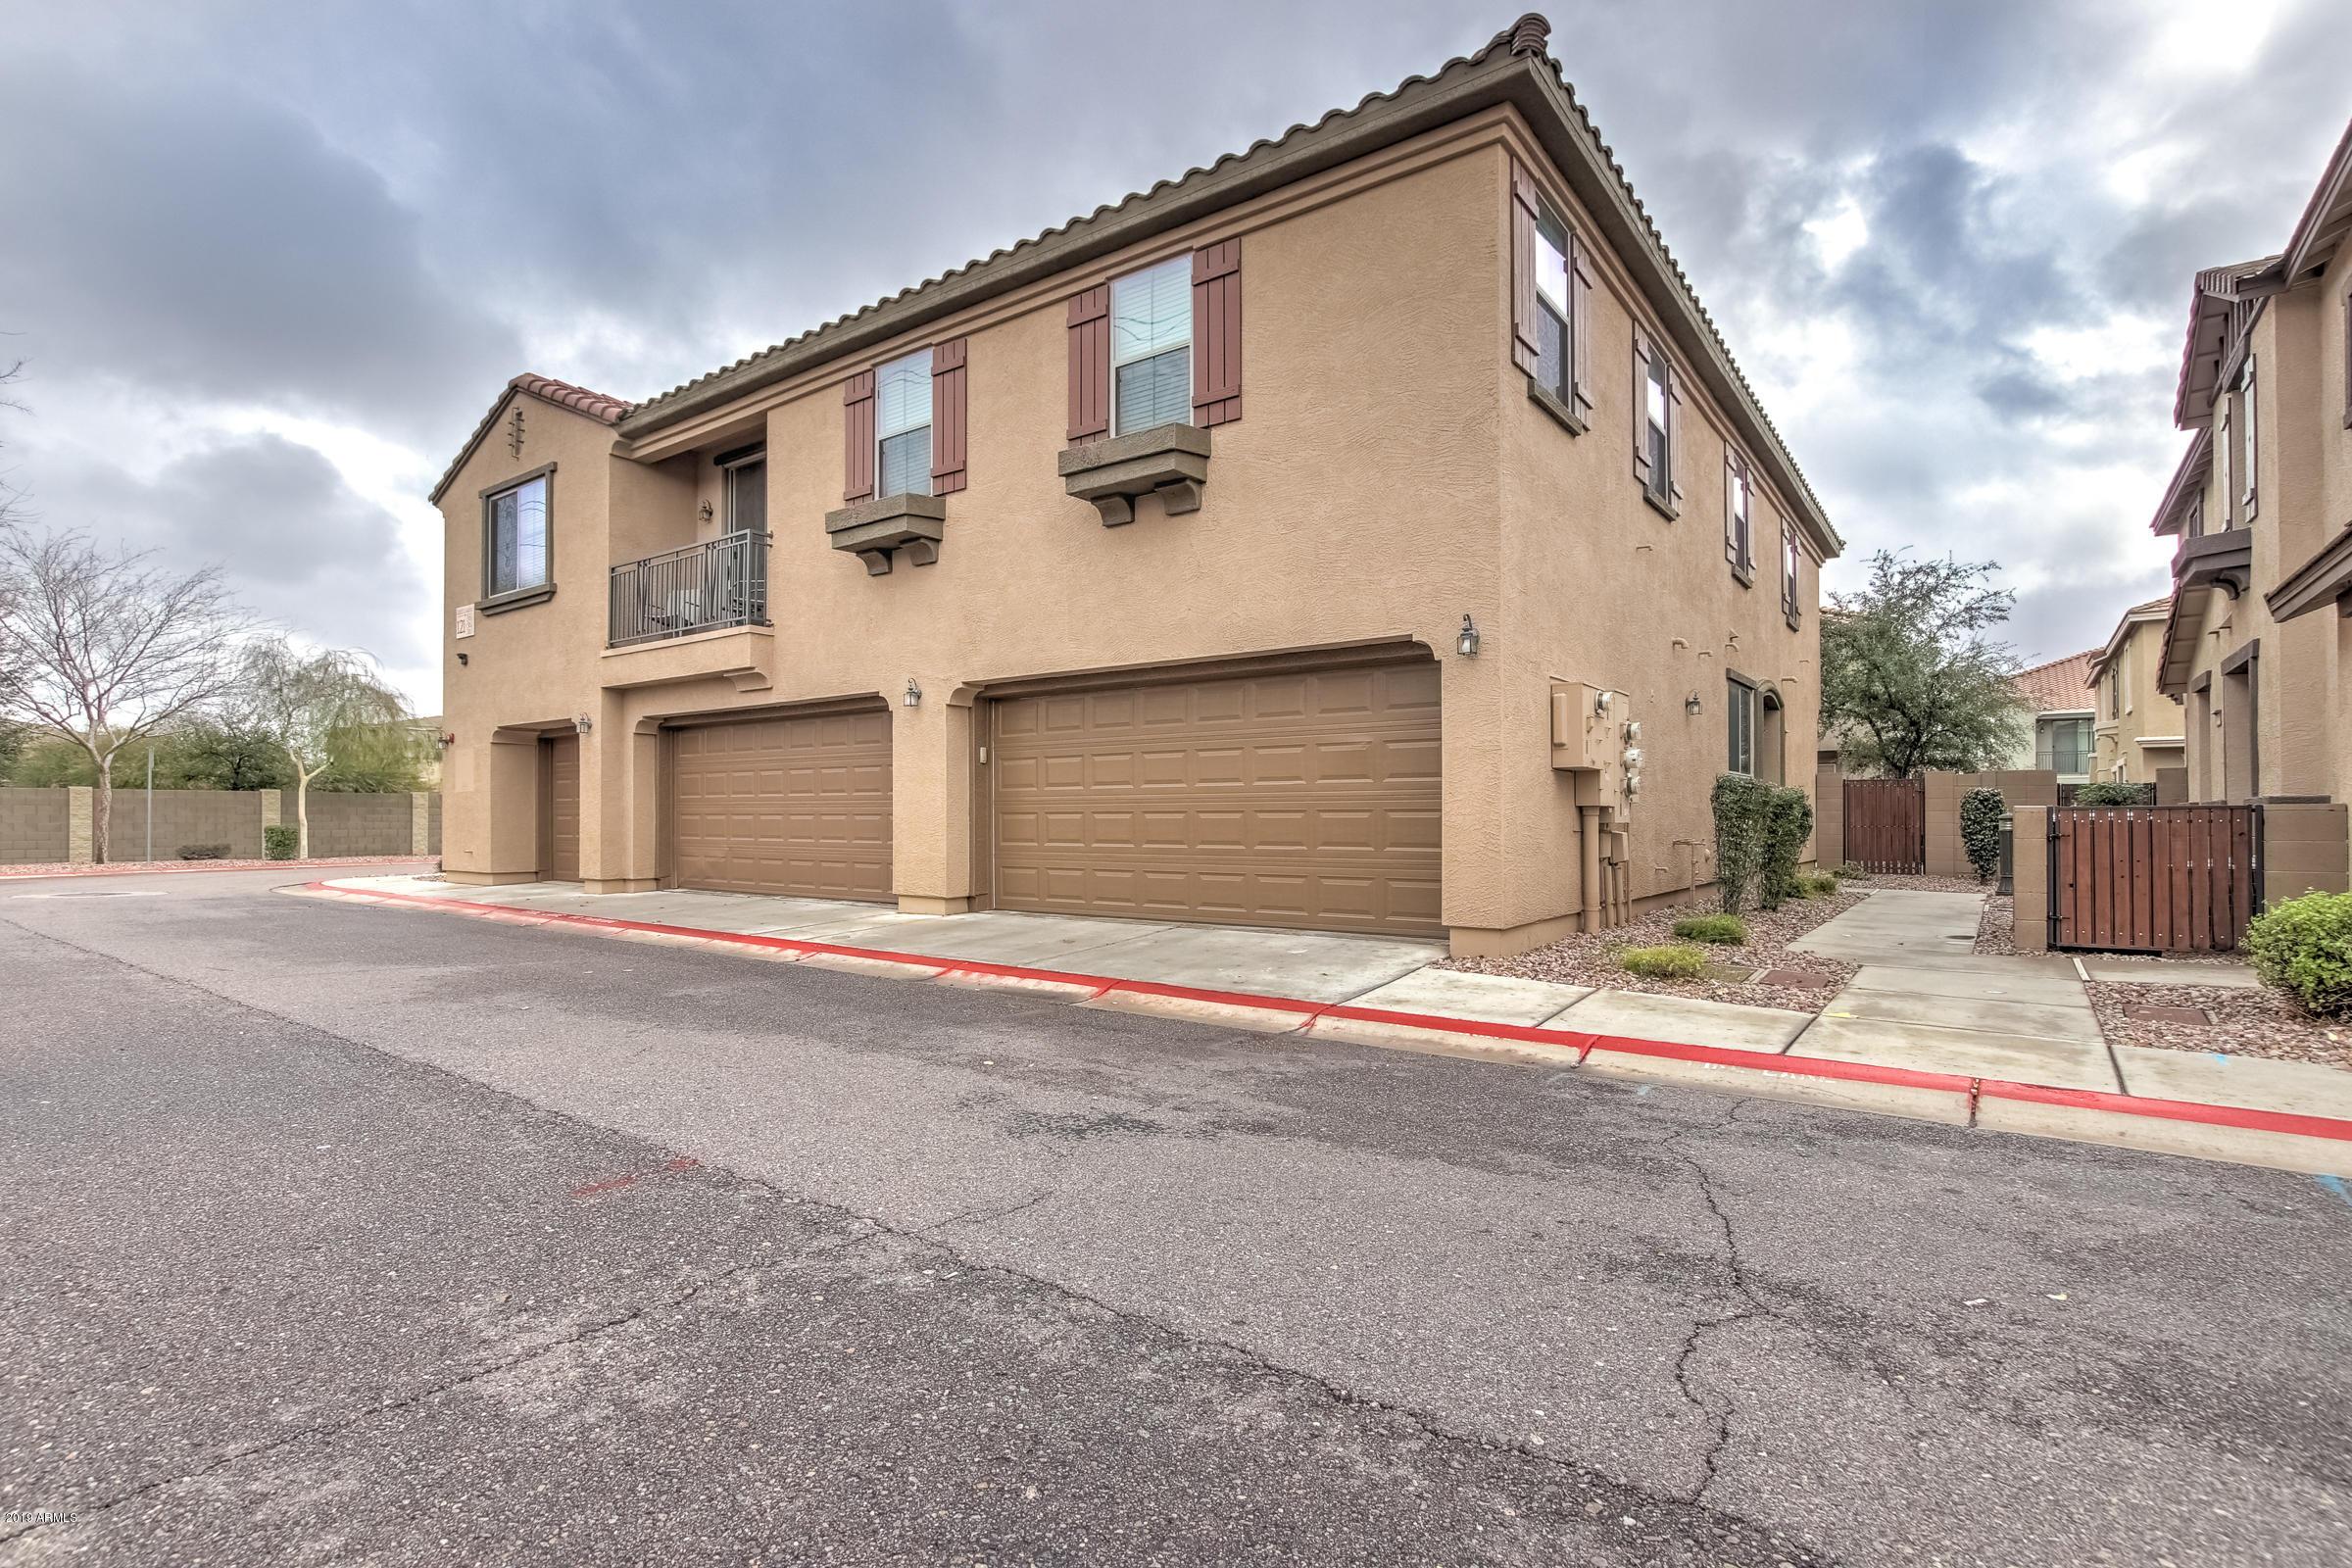 Photo of 1265 S AARON -- #363, Mesa, AZ 85209